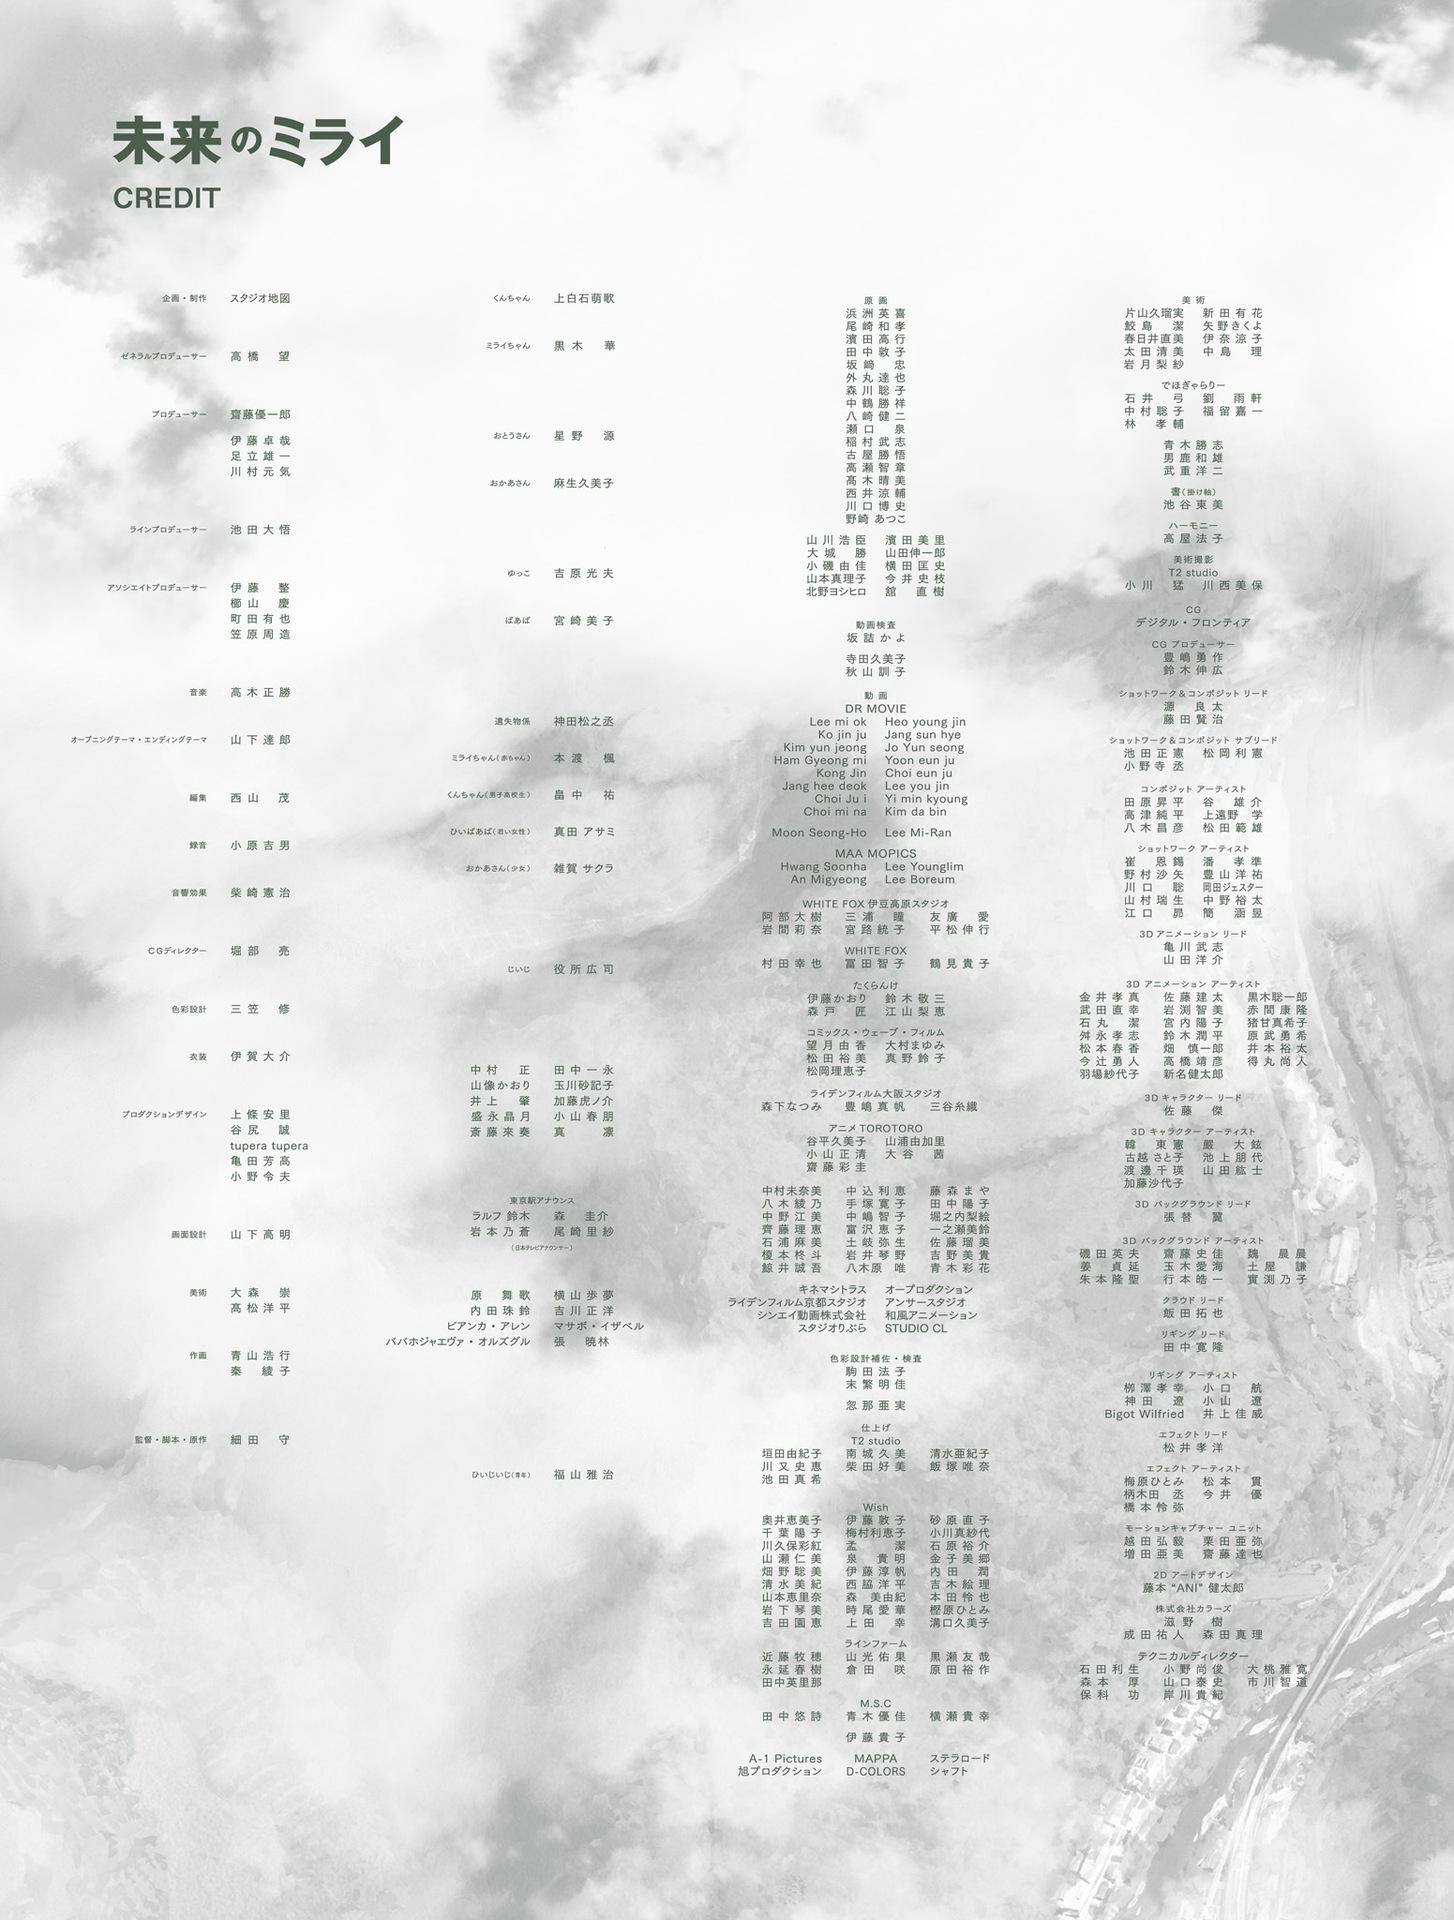 IMG (209)